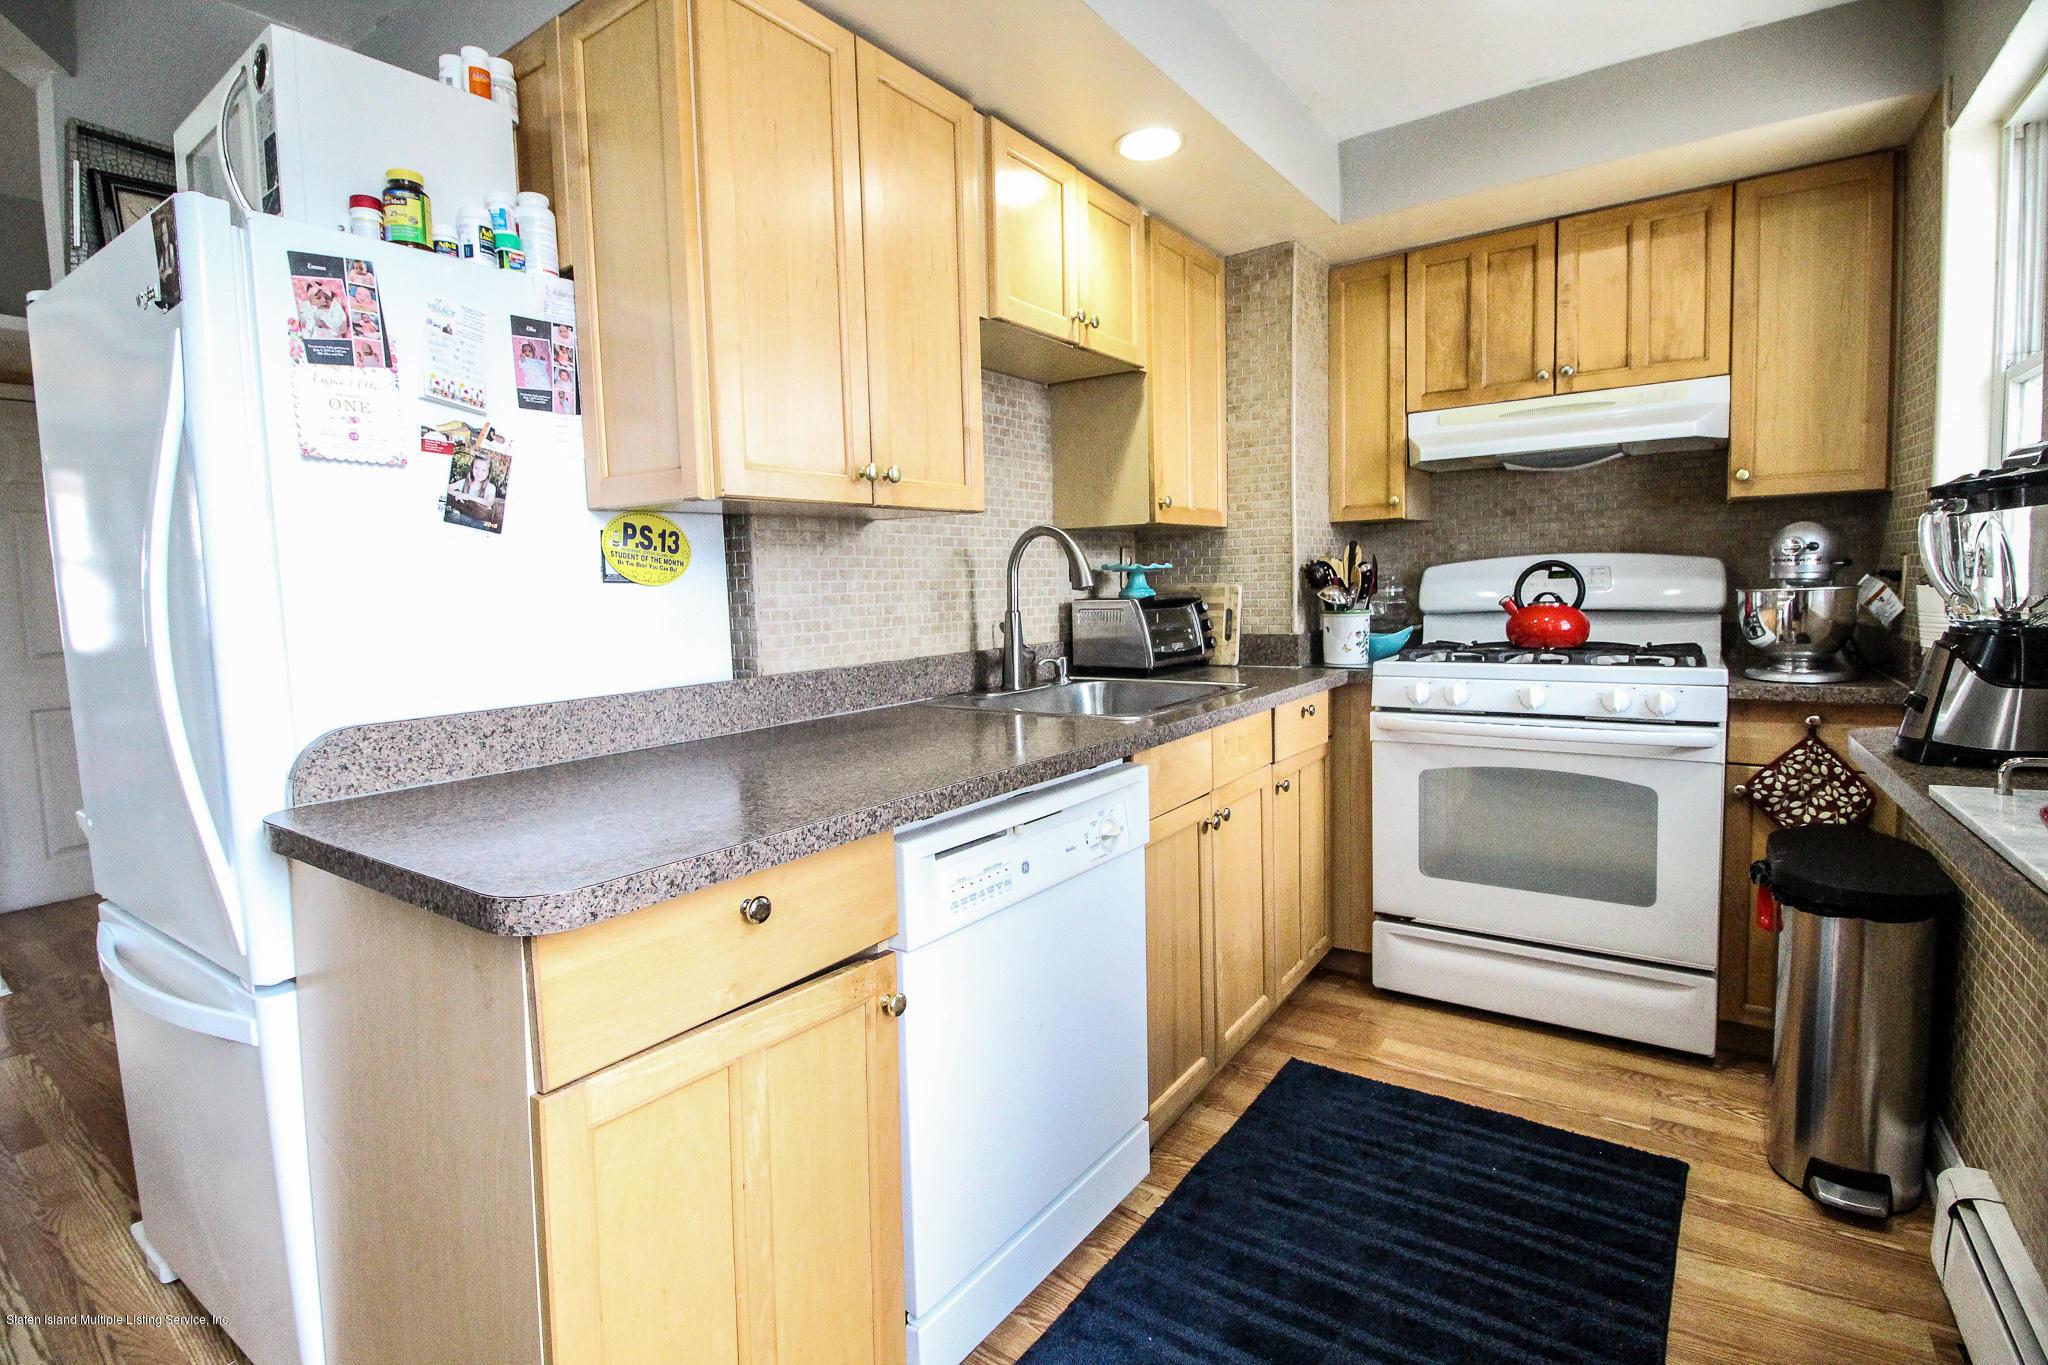 109 St Marys Avenue,Staten Island,New York,10305,United States,4 Bedrooms Bedrooms,6 Rooms Rooms,3 BathroomsBathrooms,Residential,St Marys,1134842